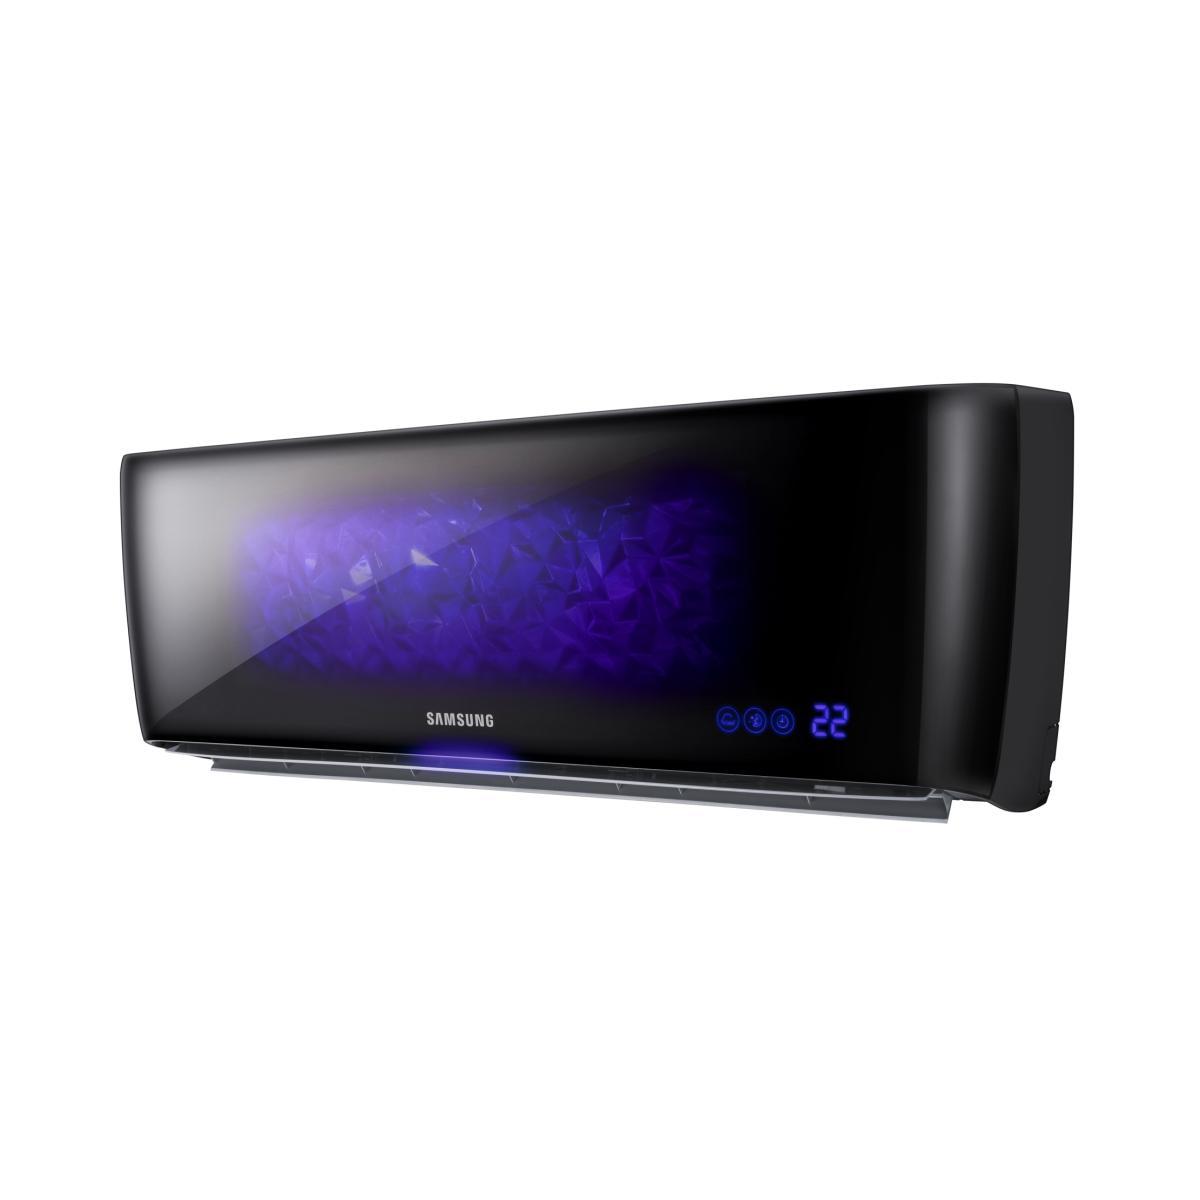 samsung jungfrau flagship 2 5kw smart wifi. Black Bedroom Furniture Sets. Home Design Ideas